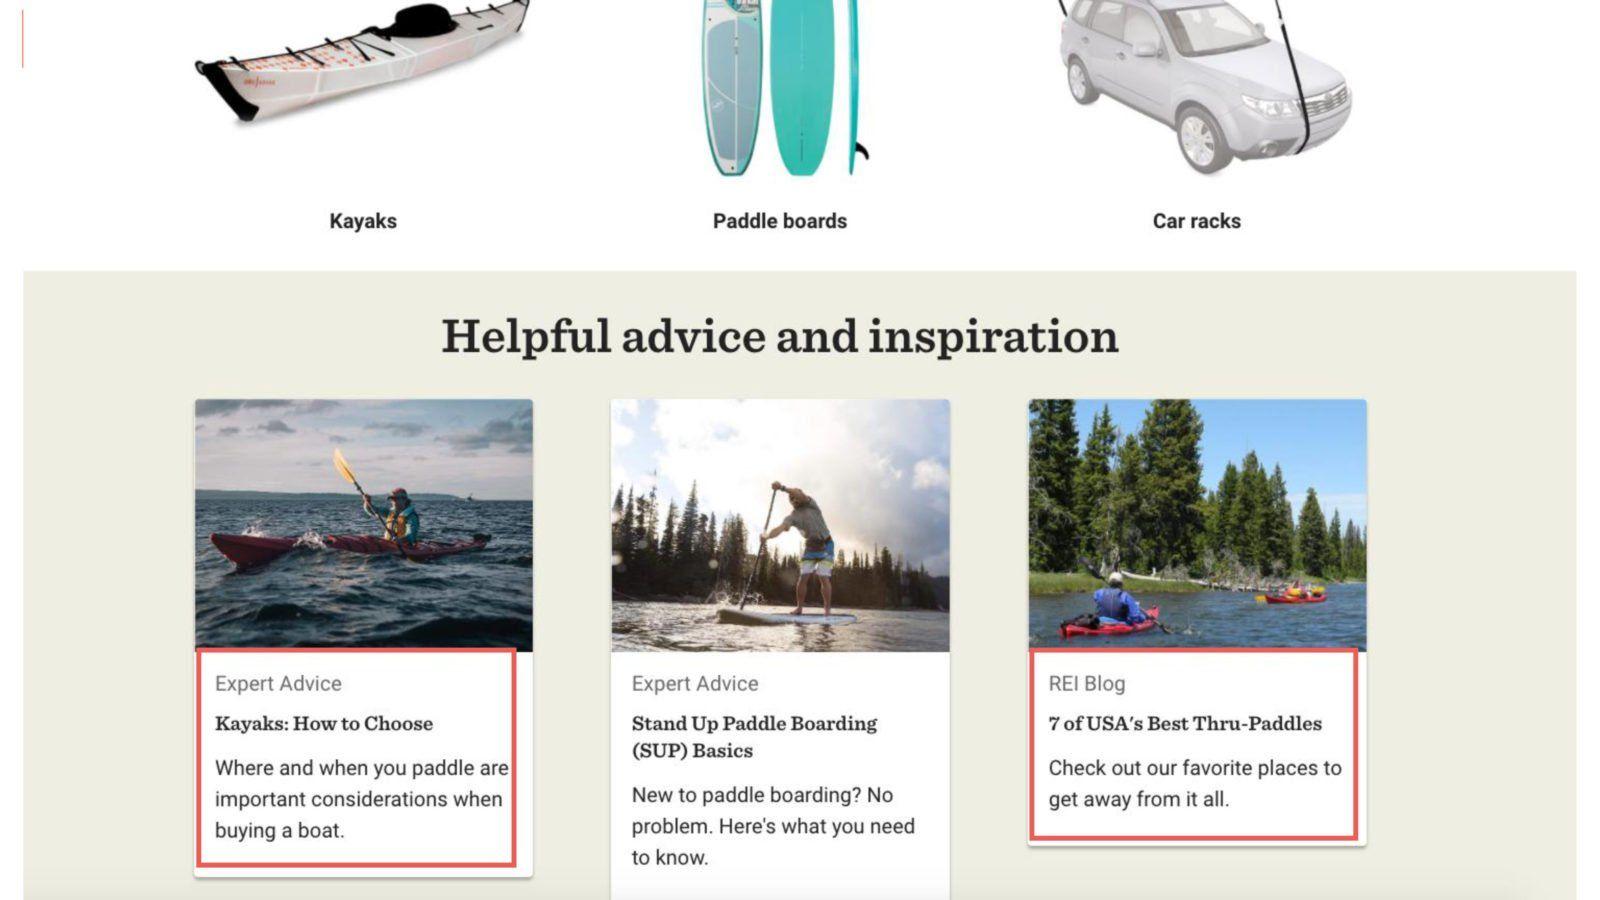 B2B Marketing Examples REI